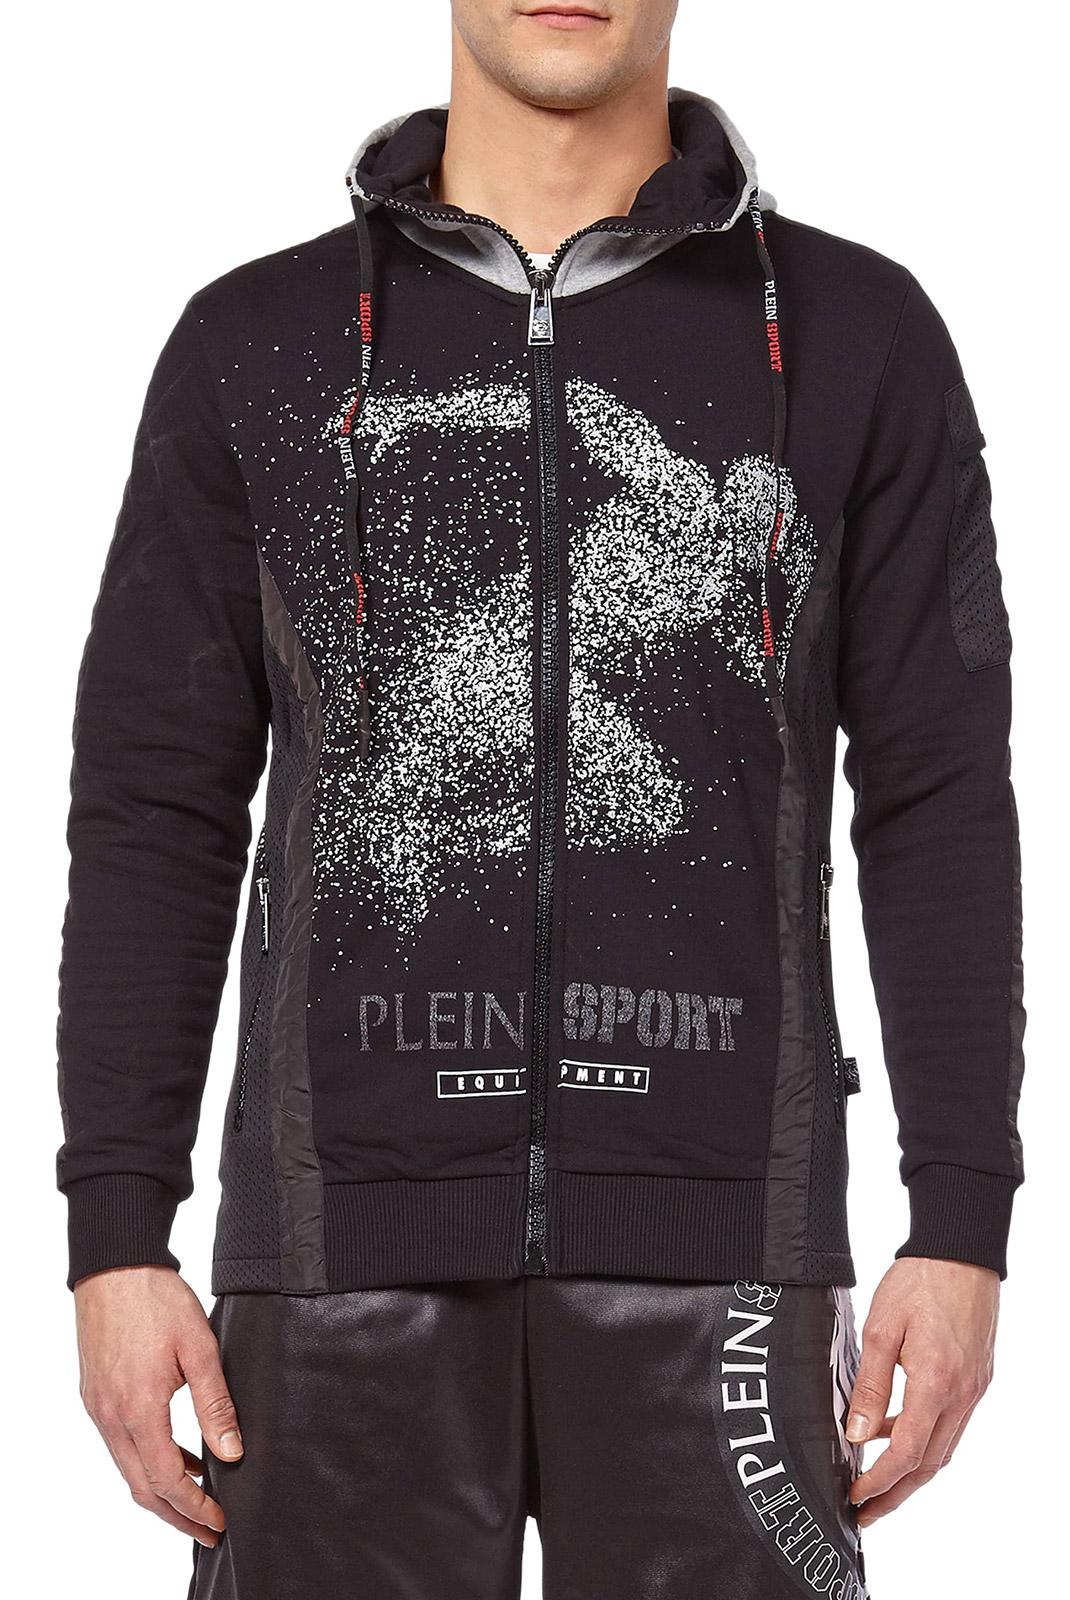 Vestes zippées  Plein Sport P17C MJB0134 02 BLACK